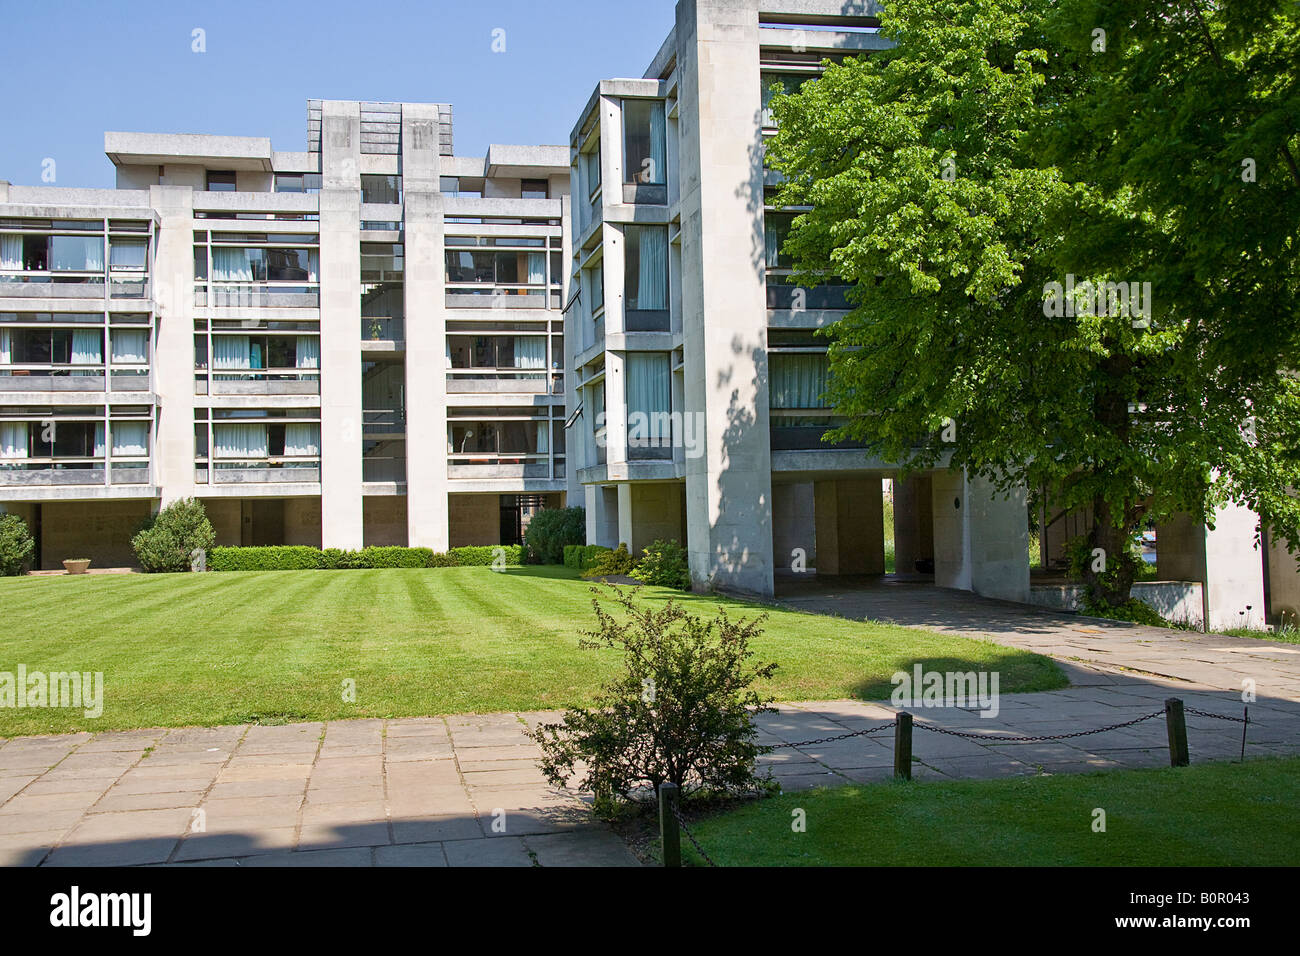 The Cripps Building, St. John's College, Cambridge. - Stock Image